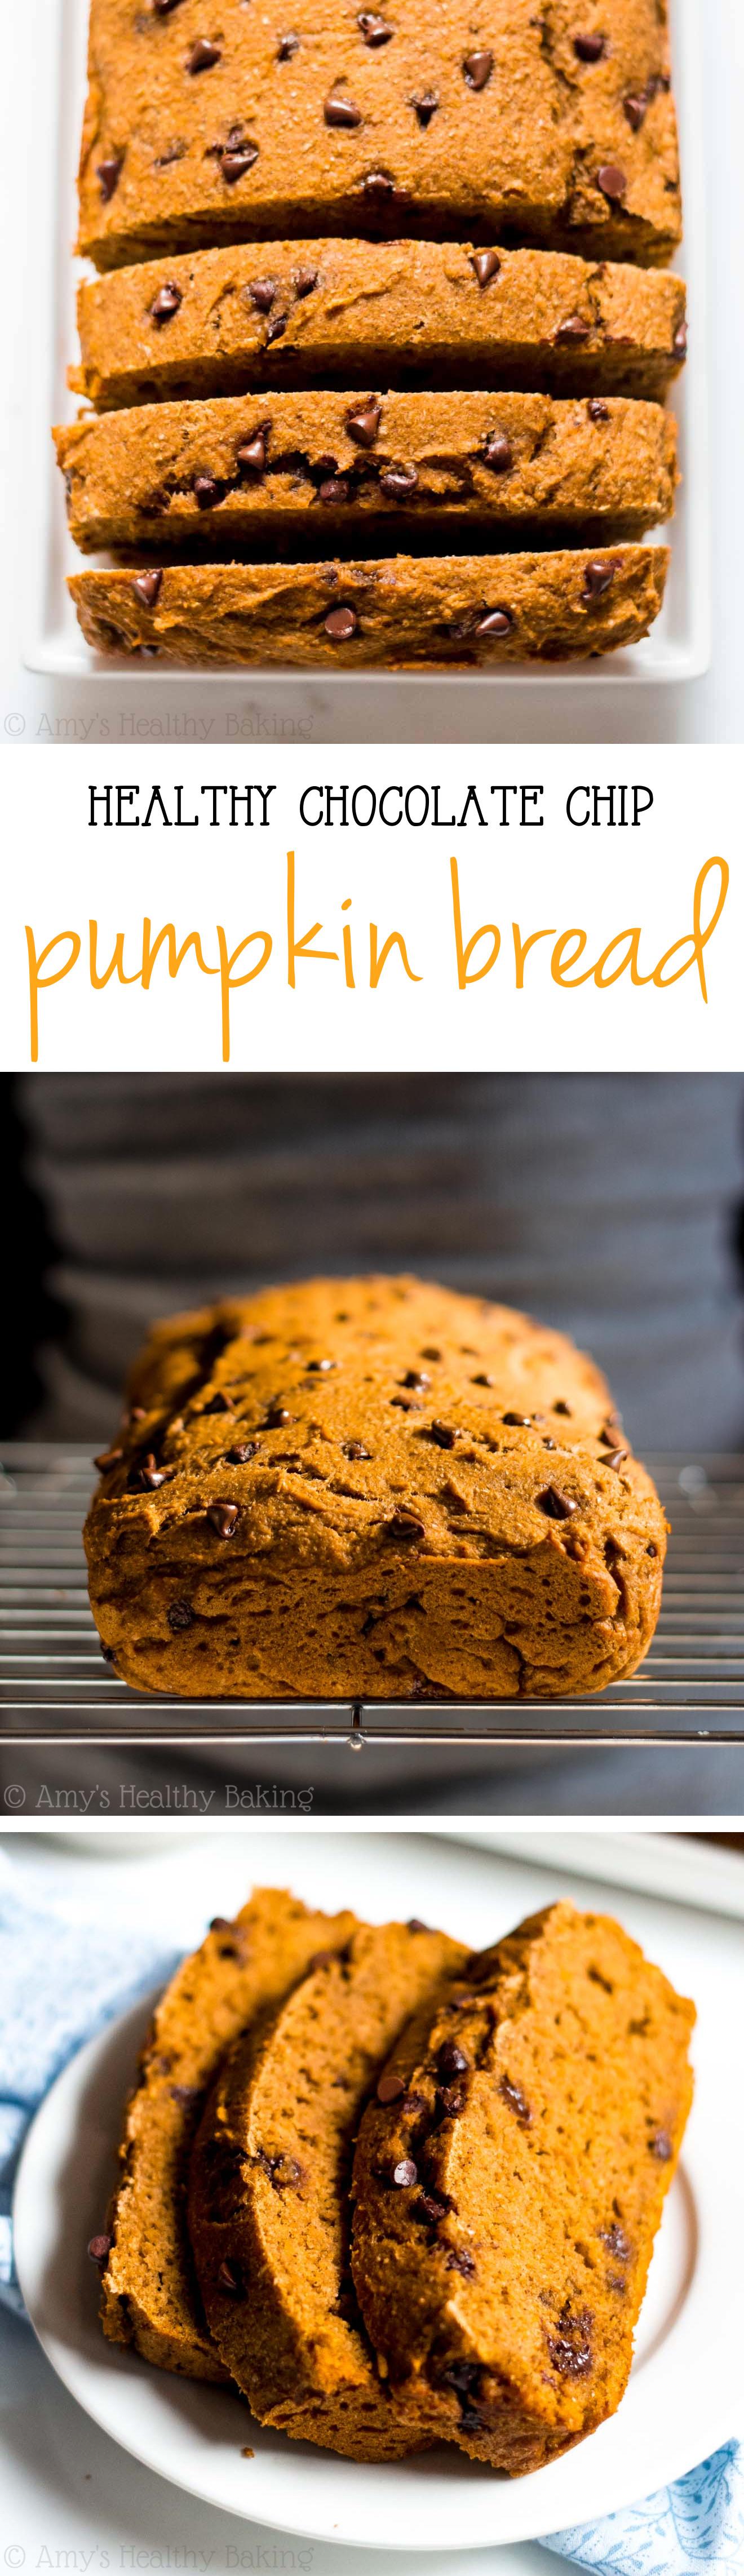 Healthy Pumpkin Chocolate Chip Bread  Chocolate Chip Pumpkin Bread